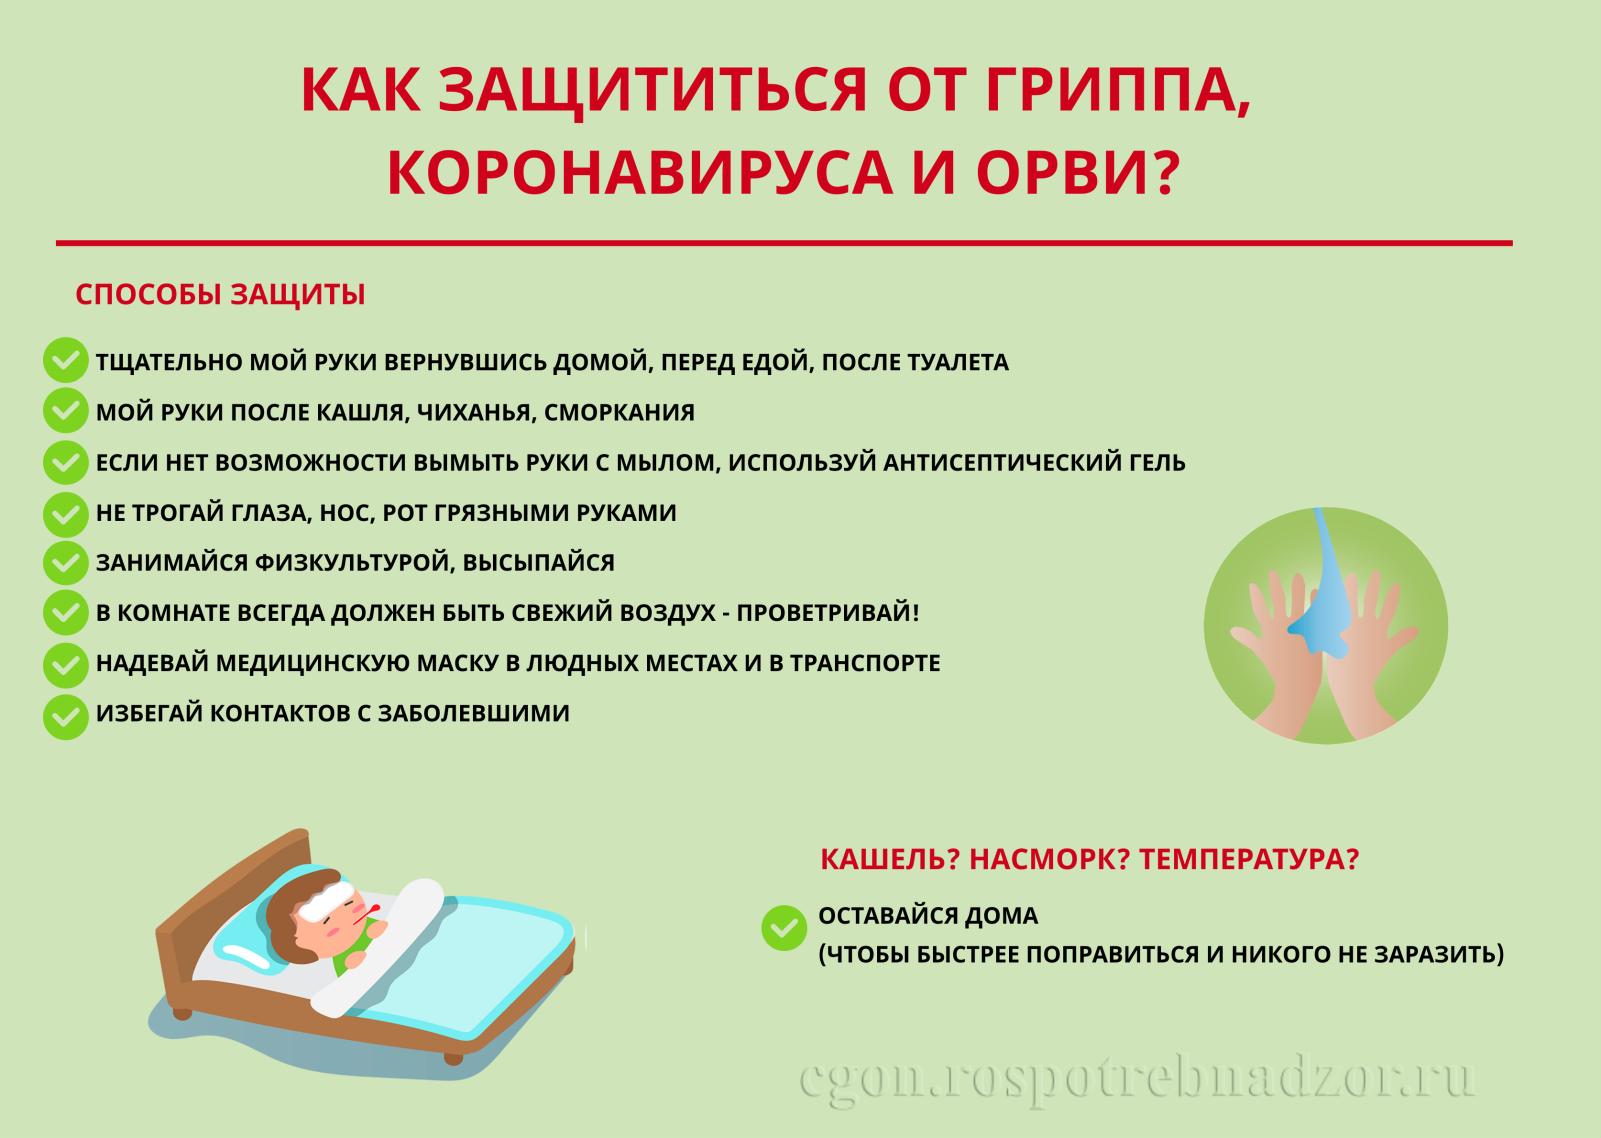 http://25.rospotrebnadzor.ru/image/image_gallery?uuid=d32decef-e418-4534-9e5f-74e9821eedad&groupId=10156&t=1580701188654